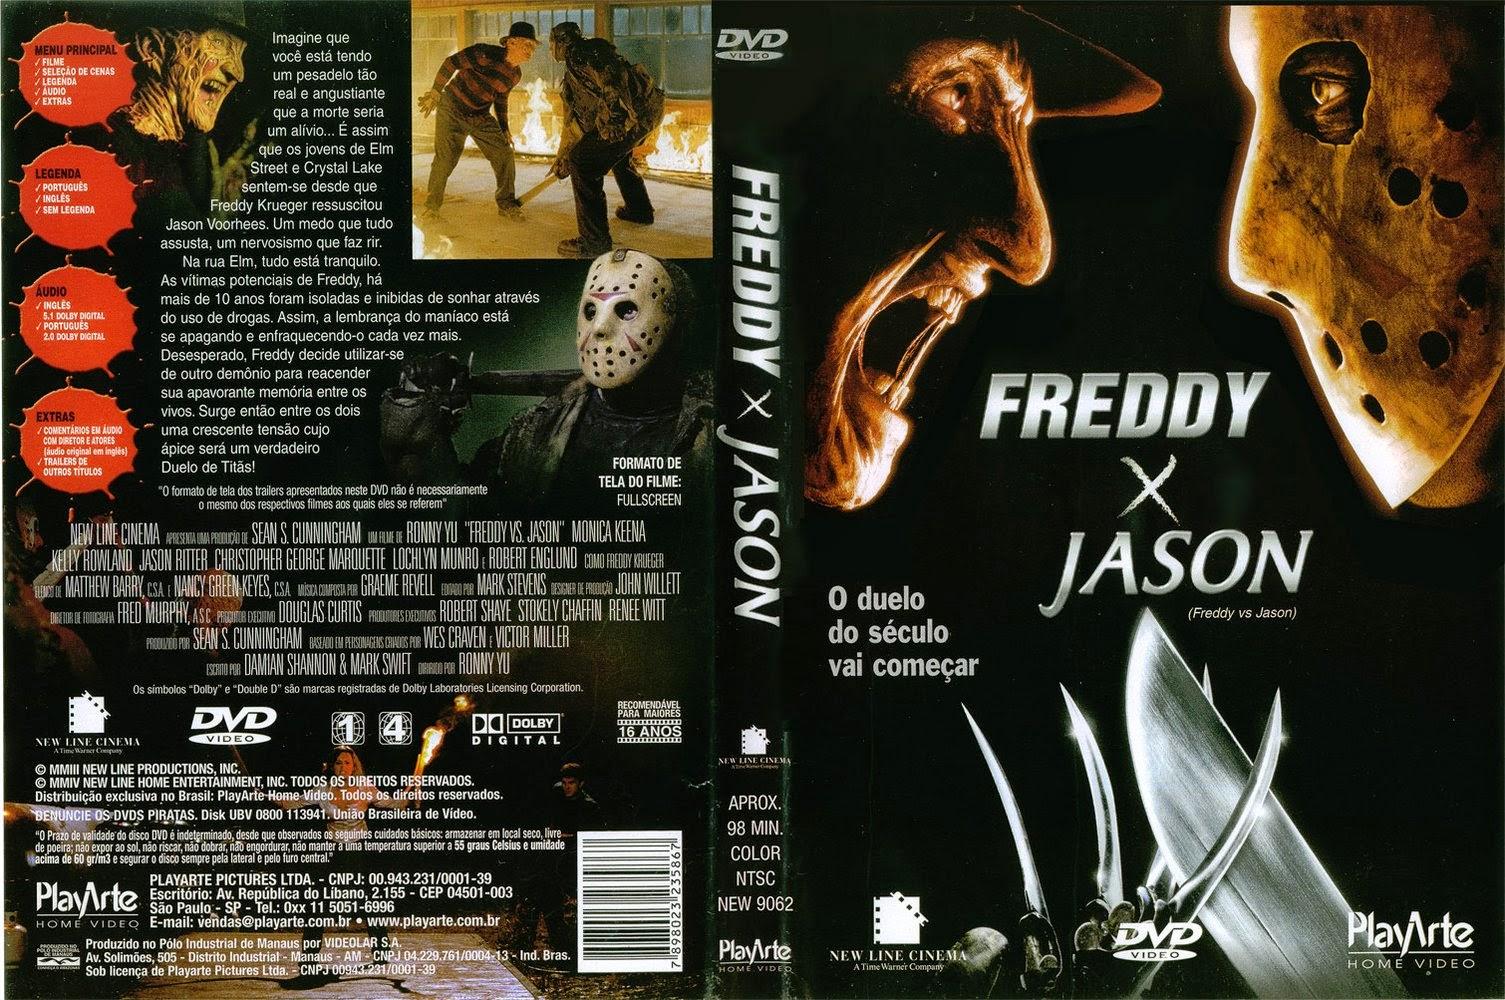 Freddy vs Jason DVD Capa